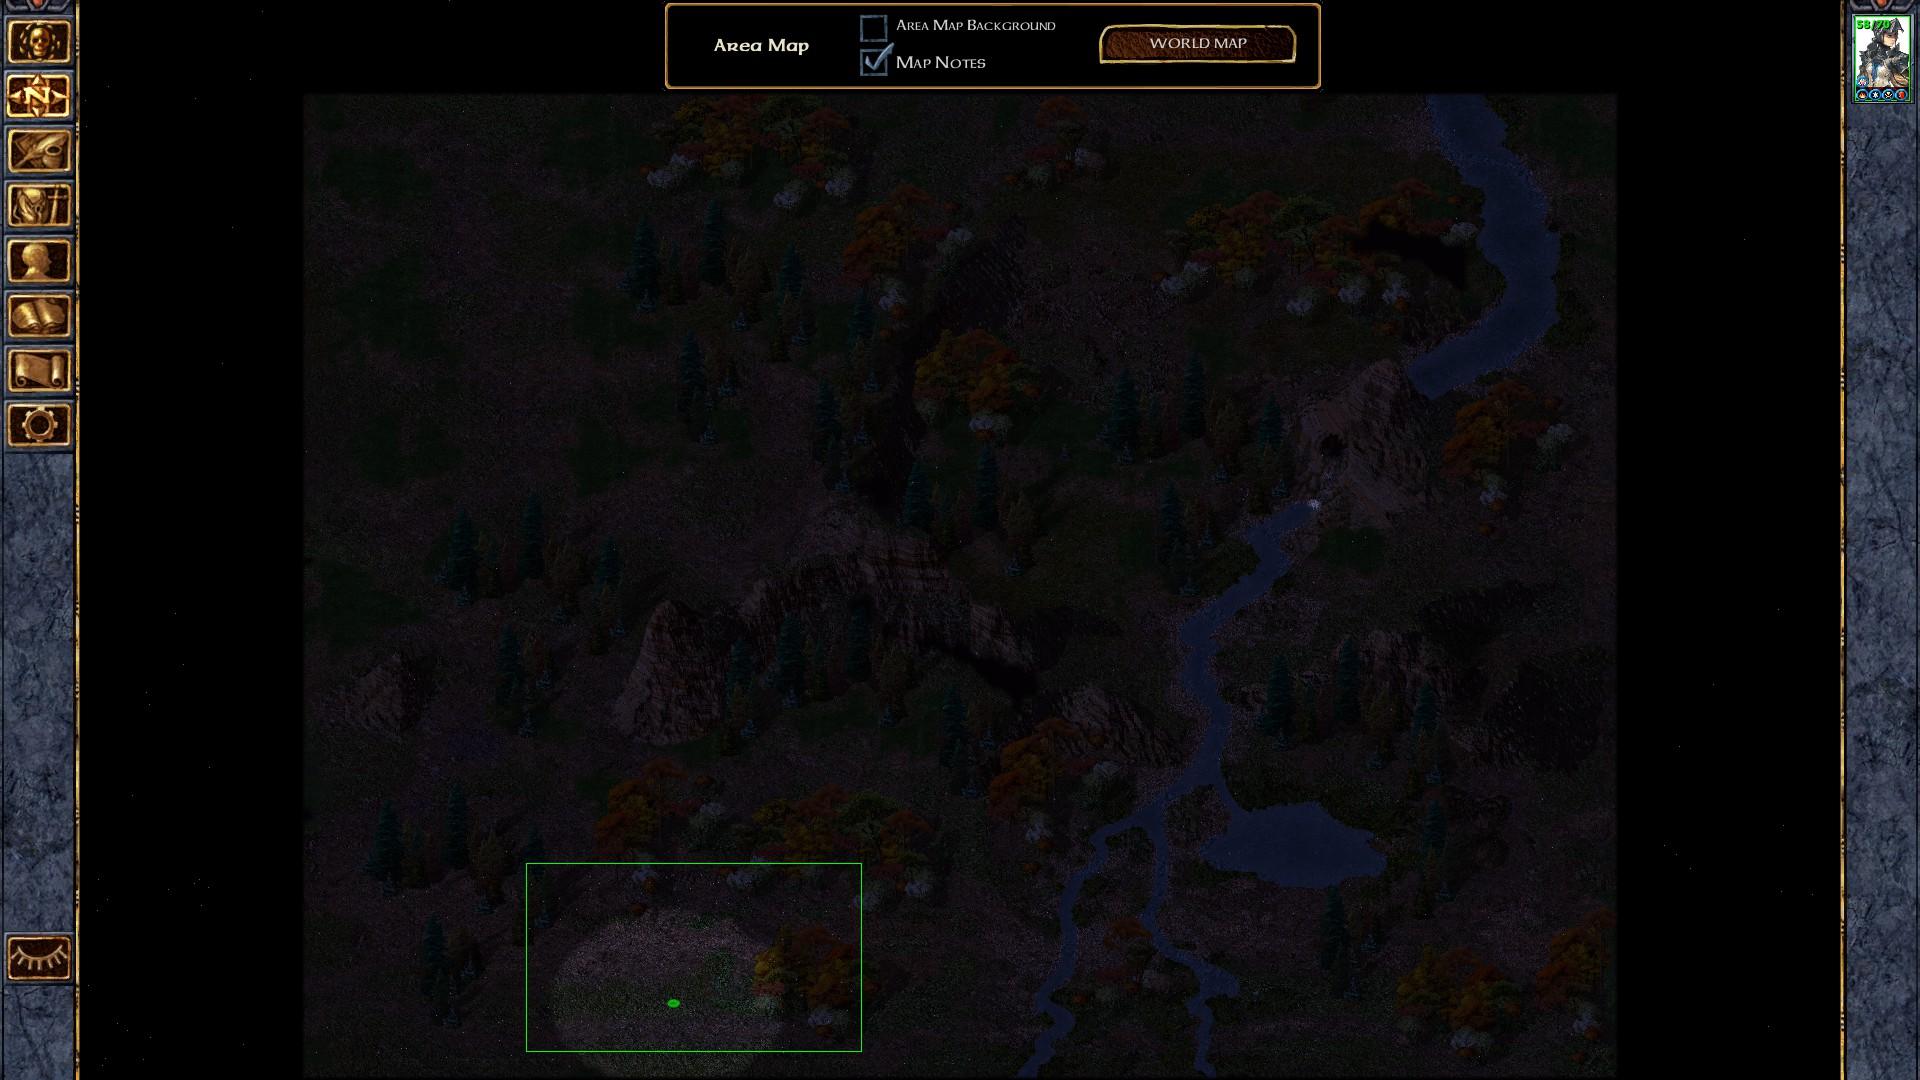 Baldur's Gate Solo Cavalier Run - Advice and Discussion